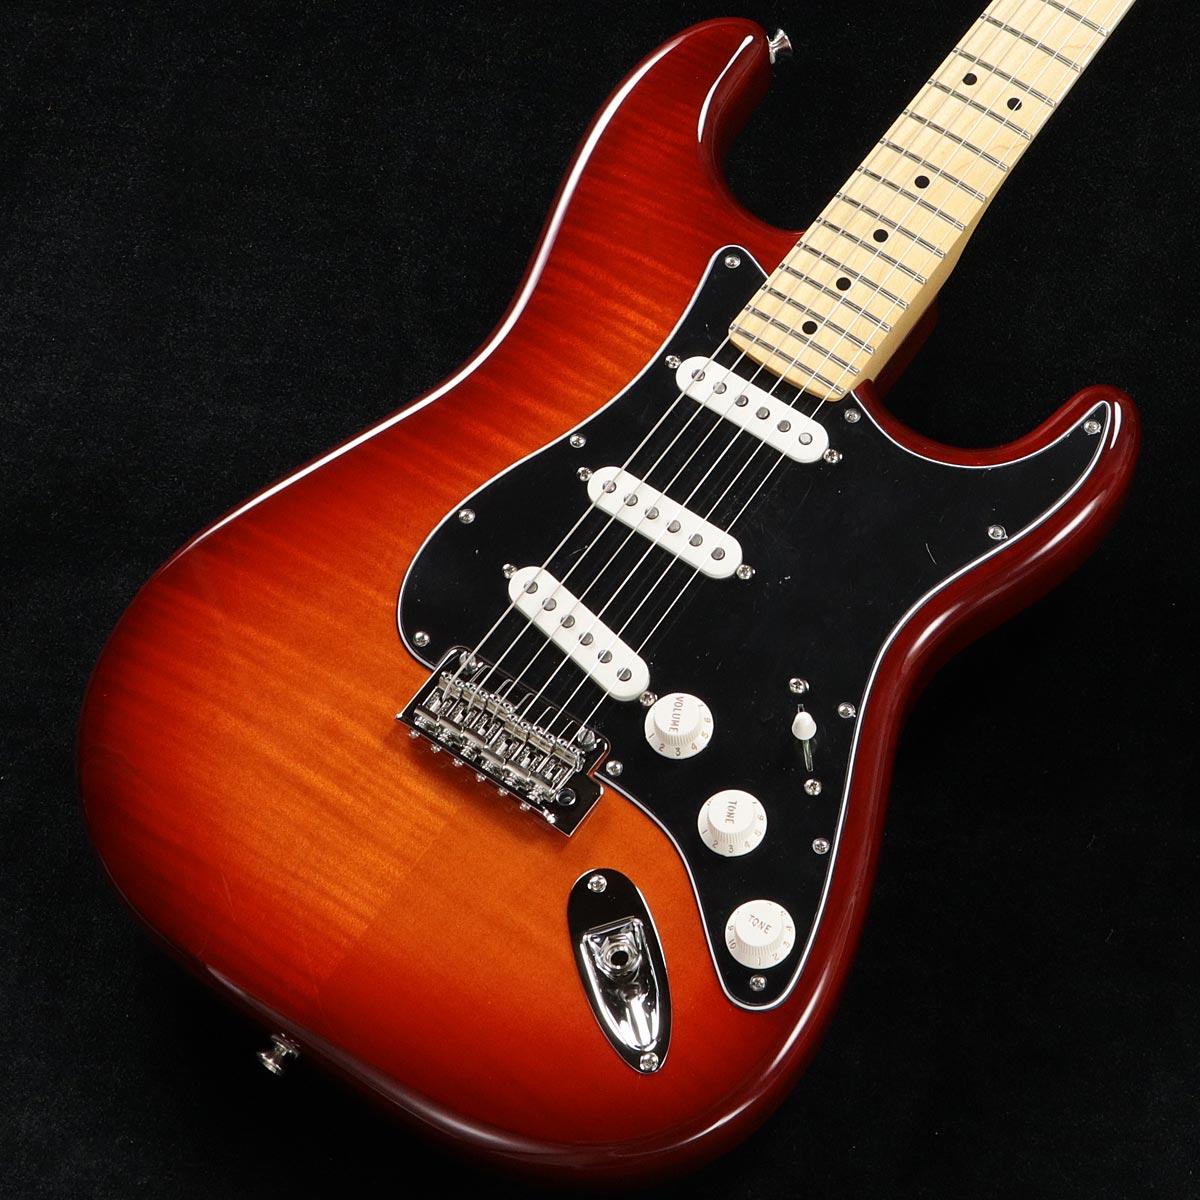 Fender / Player Series Stratocaster Plus Top Aged Cherry Burst Maple【渋谷店】